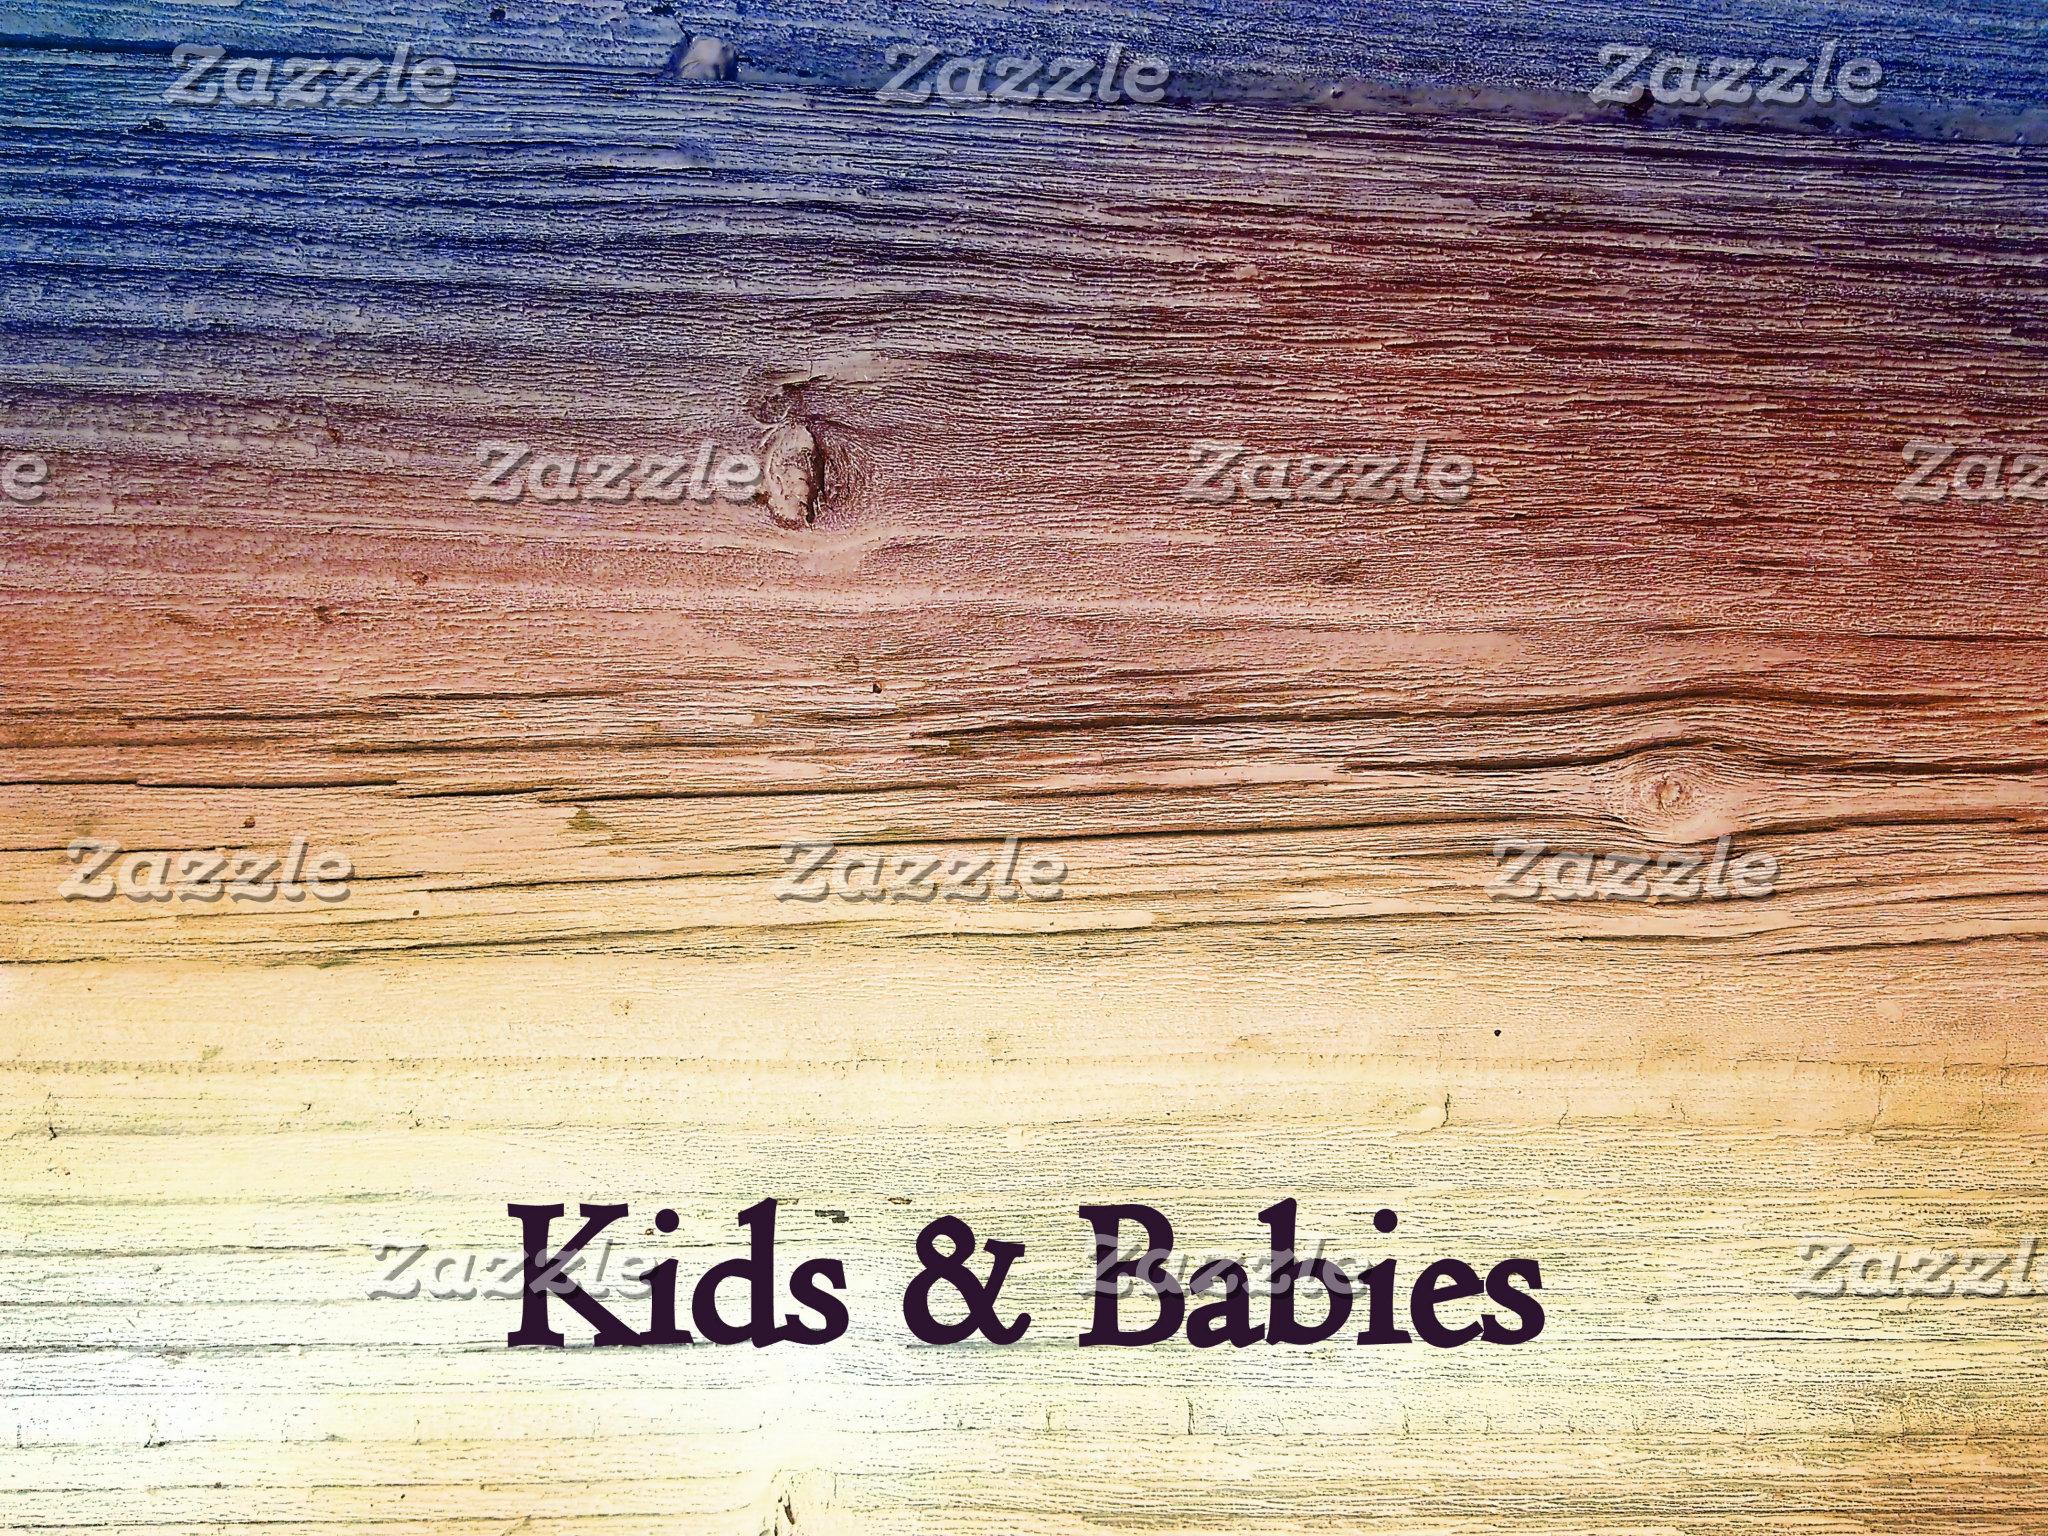 Kids & Babies